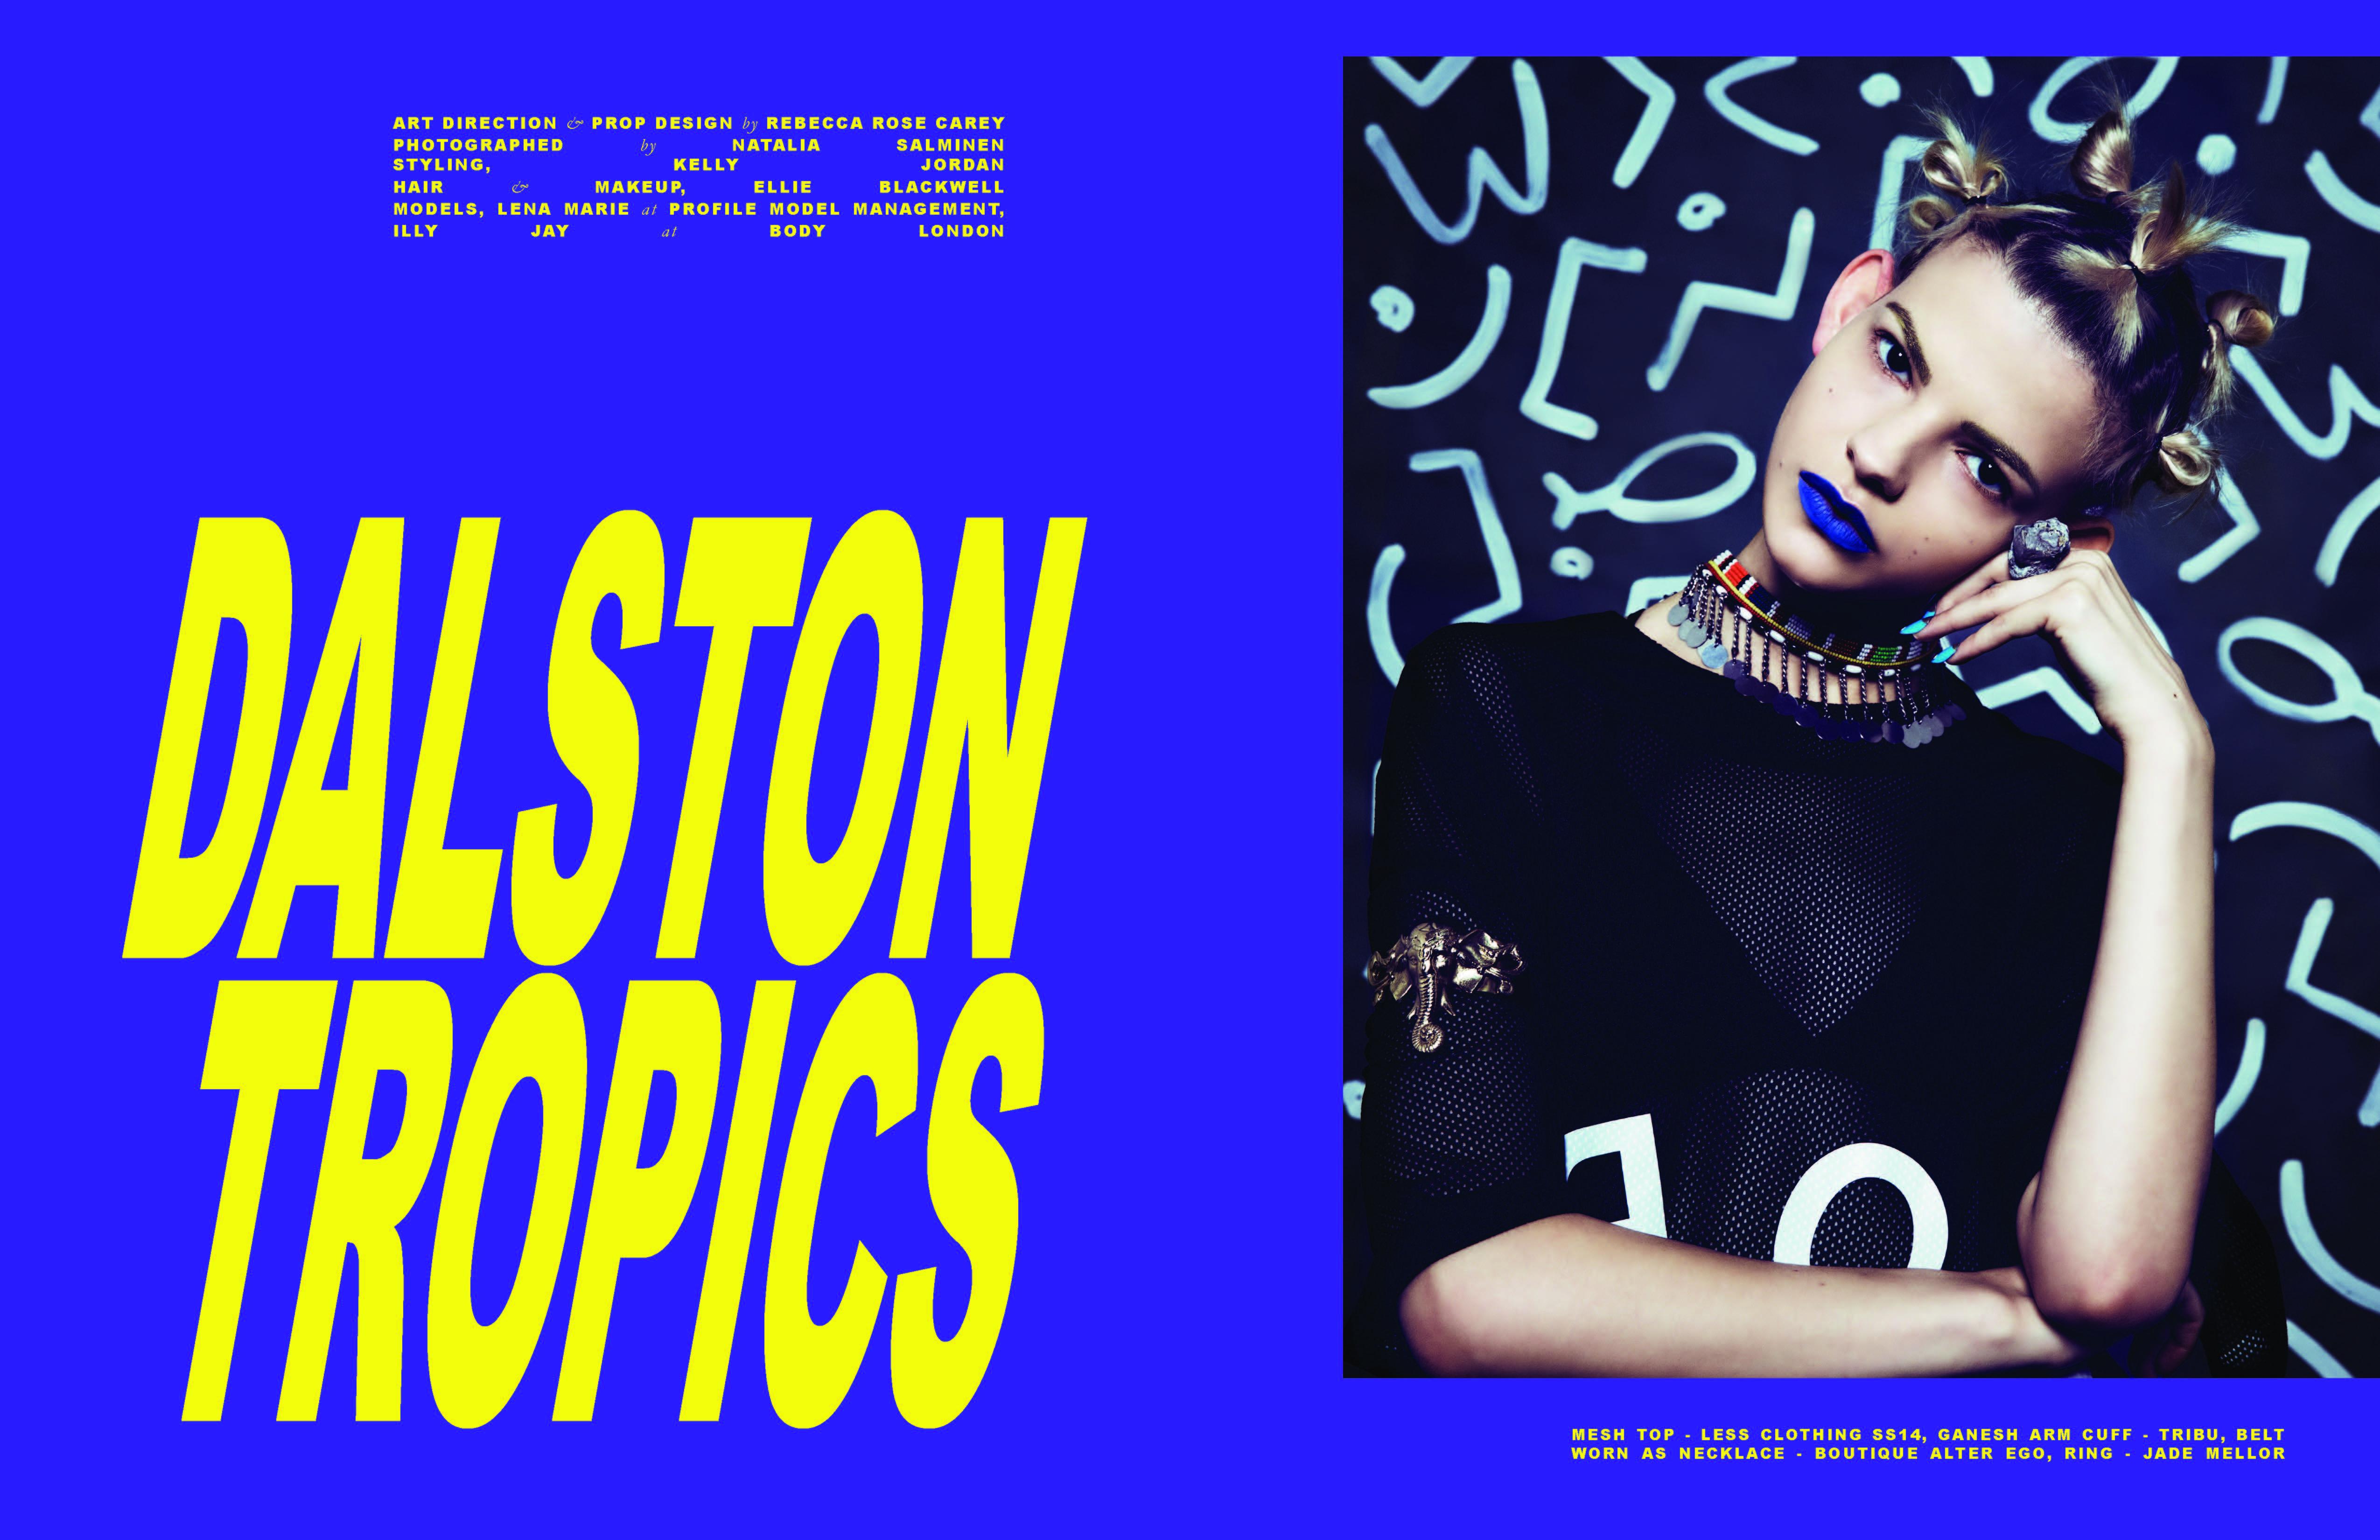 Dalston Tropics